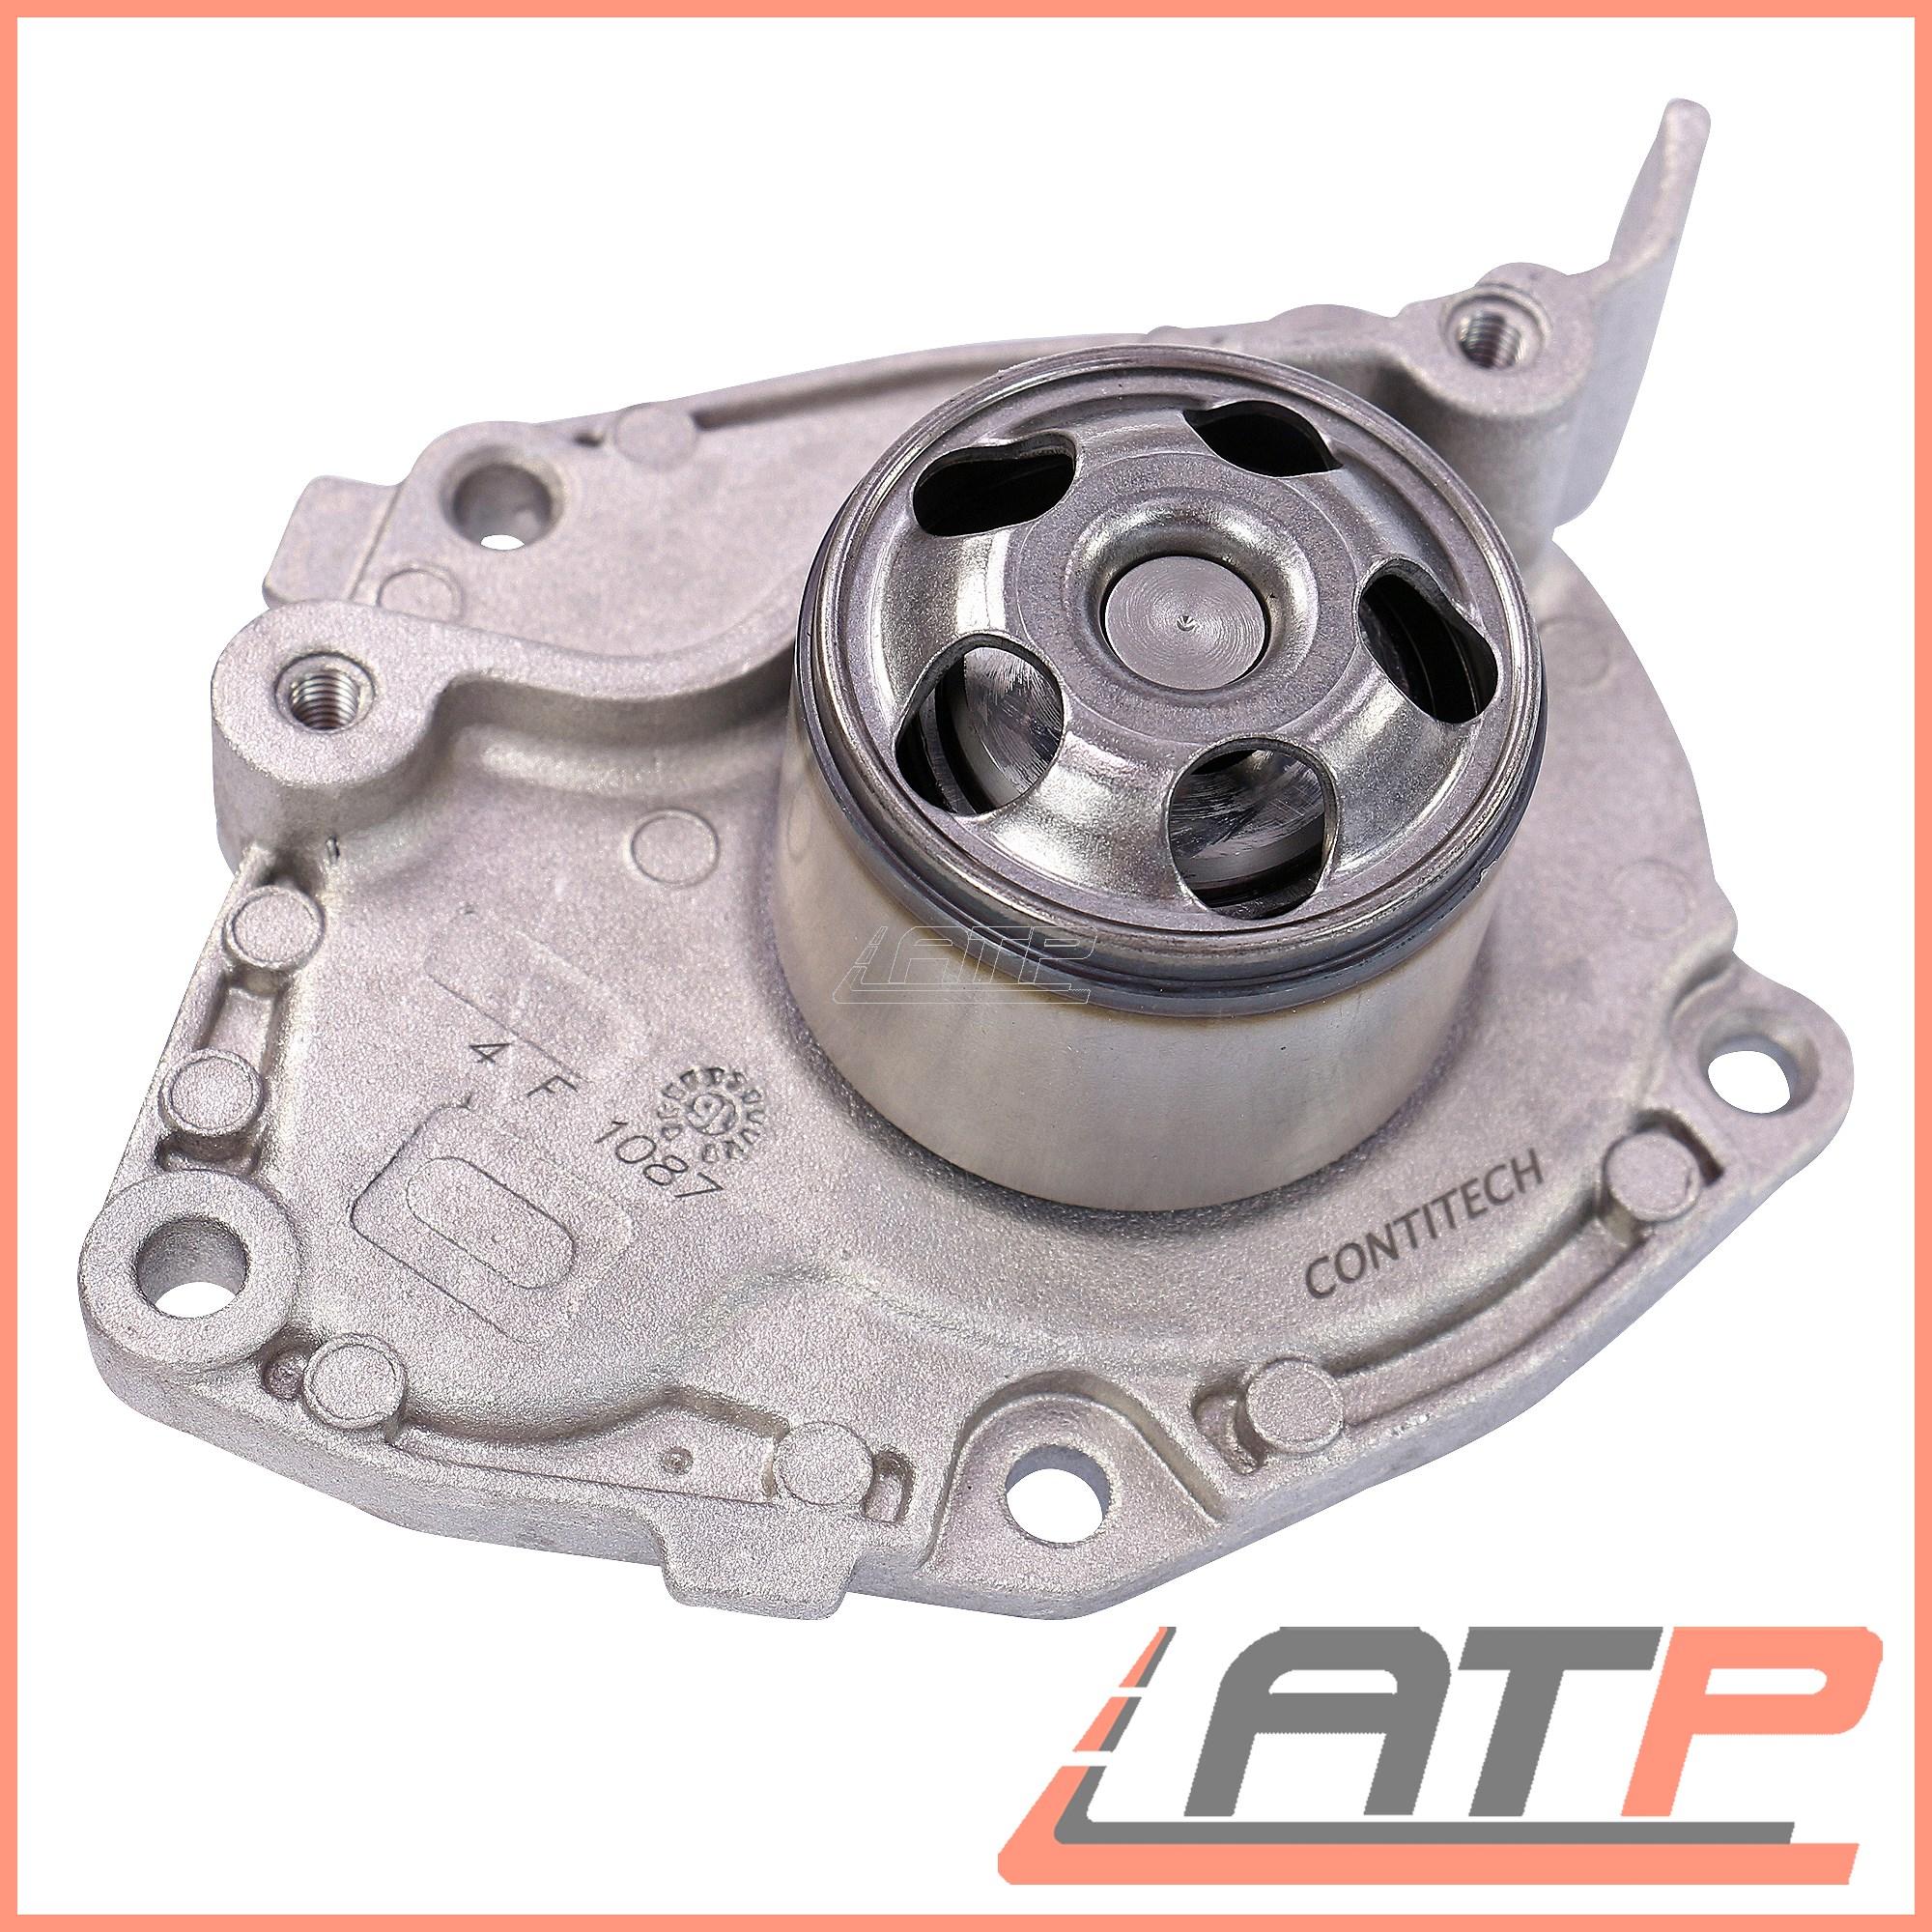 CONTITECH TIMING CAM Belt Kit + Water Pump Volvo S40 Mk 1 00-03 V40 1 9